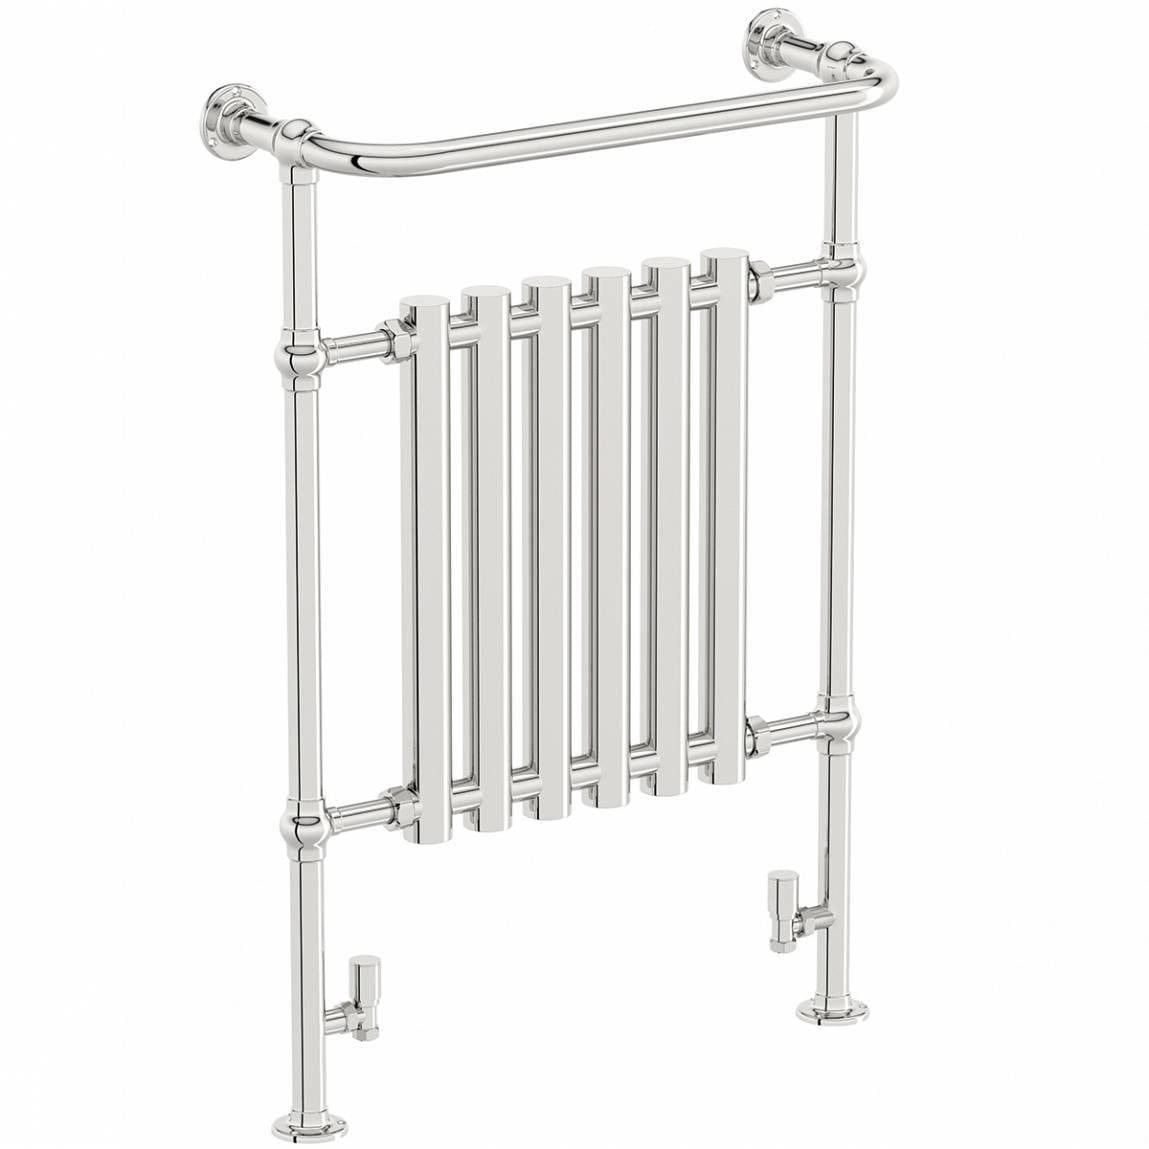 The Bath Co. Camberley radiator 952 x 659